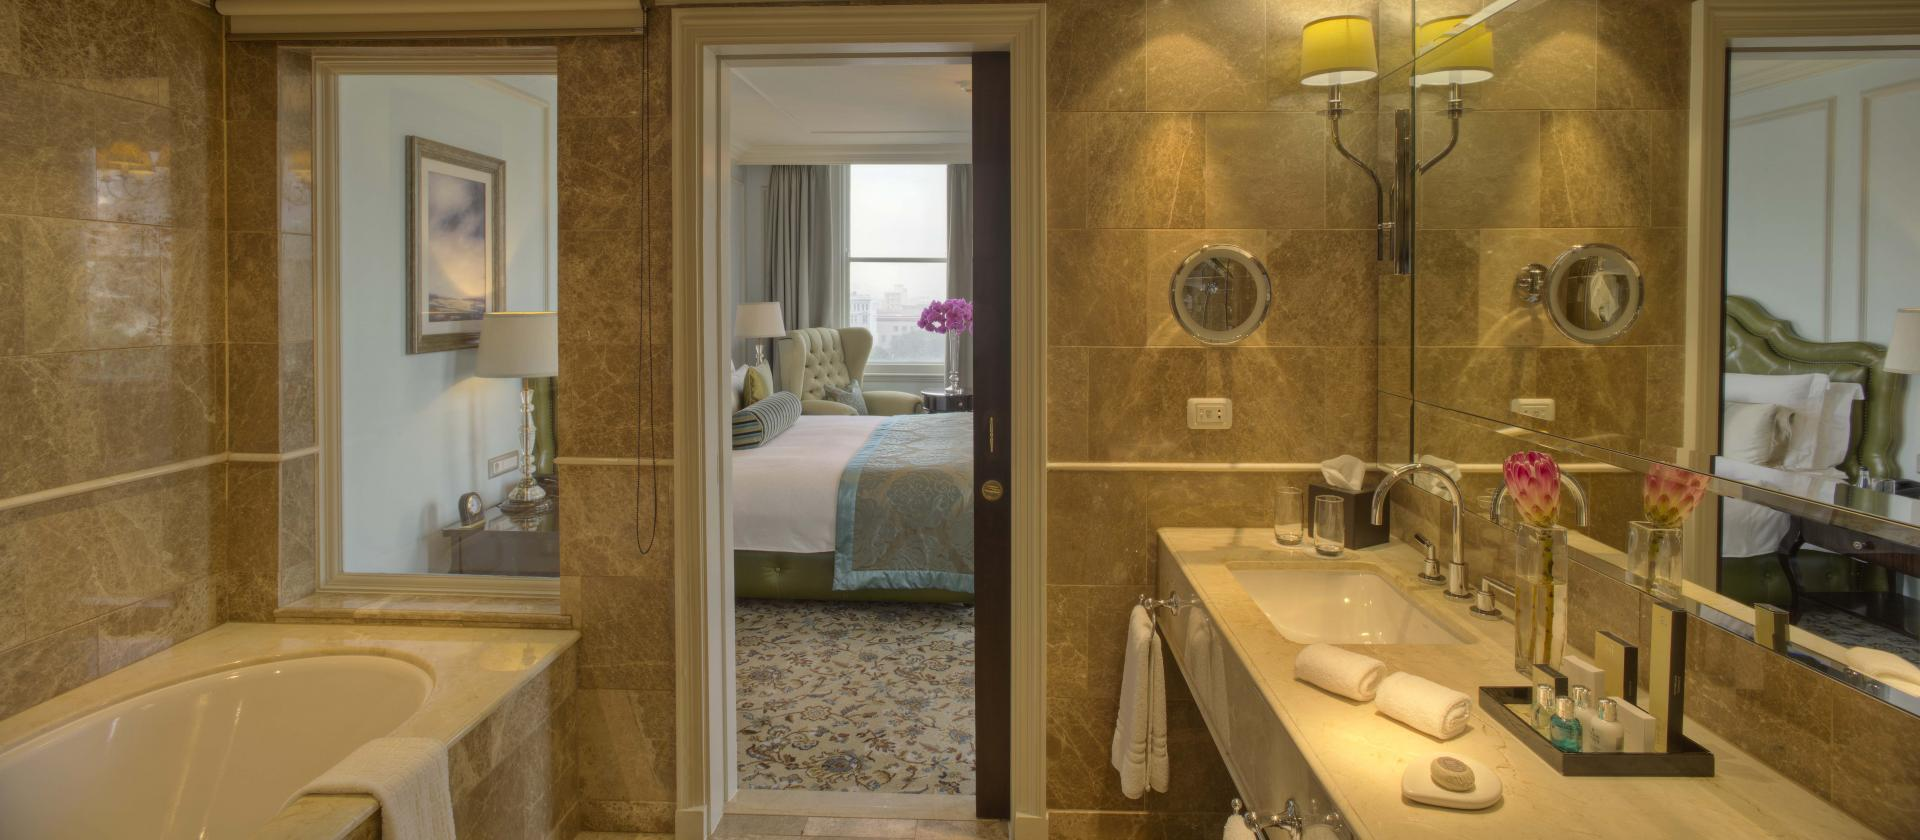 Bathroom at Taj Cape Town, Centre, Cape Town